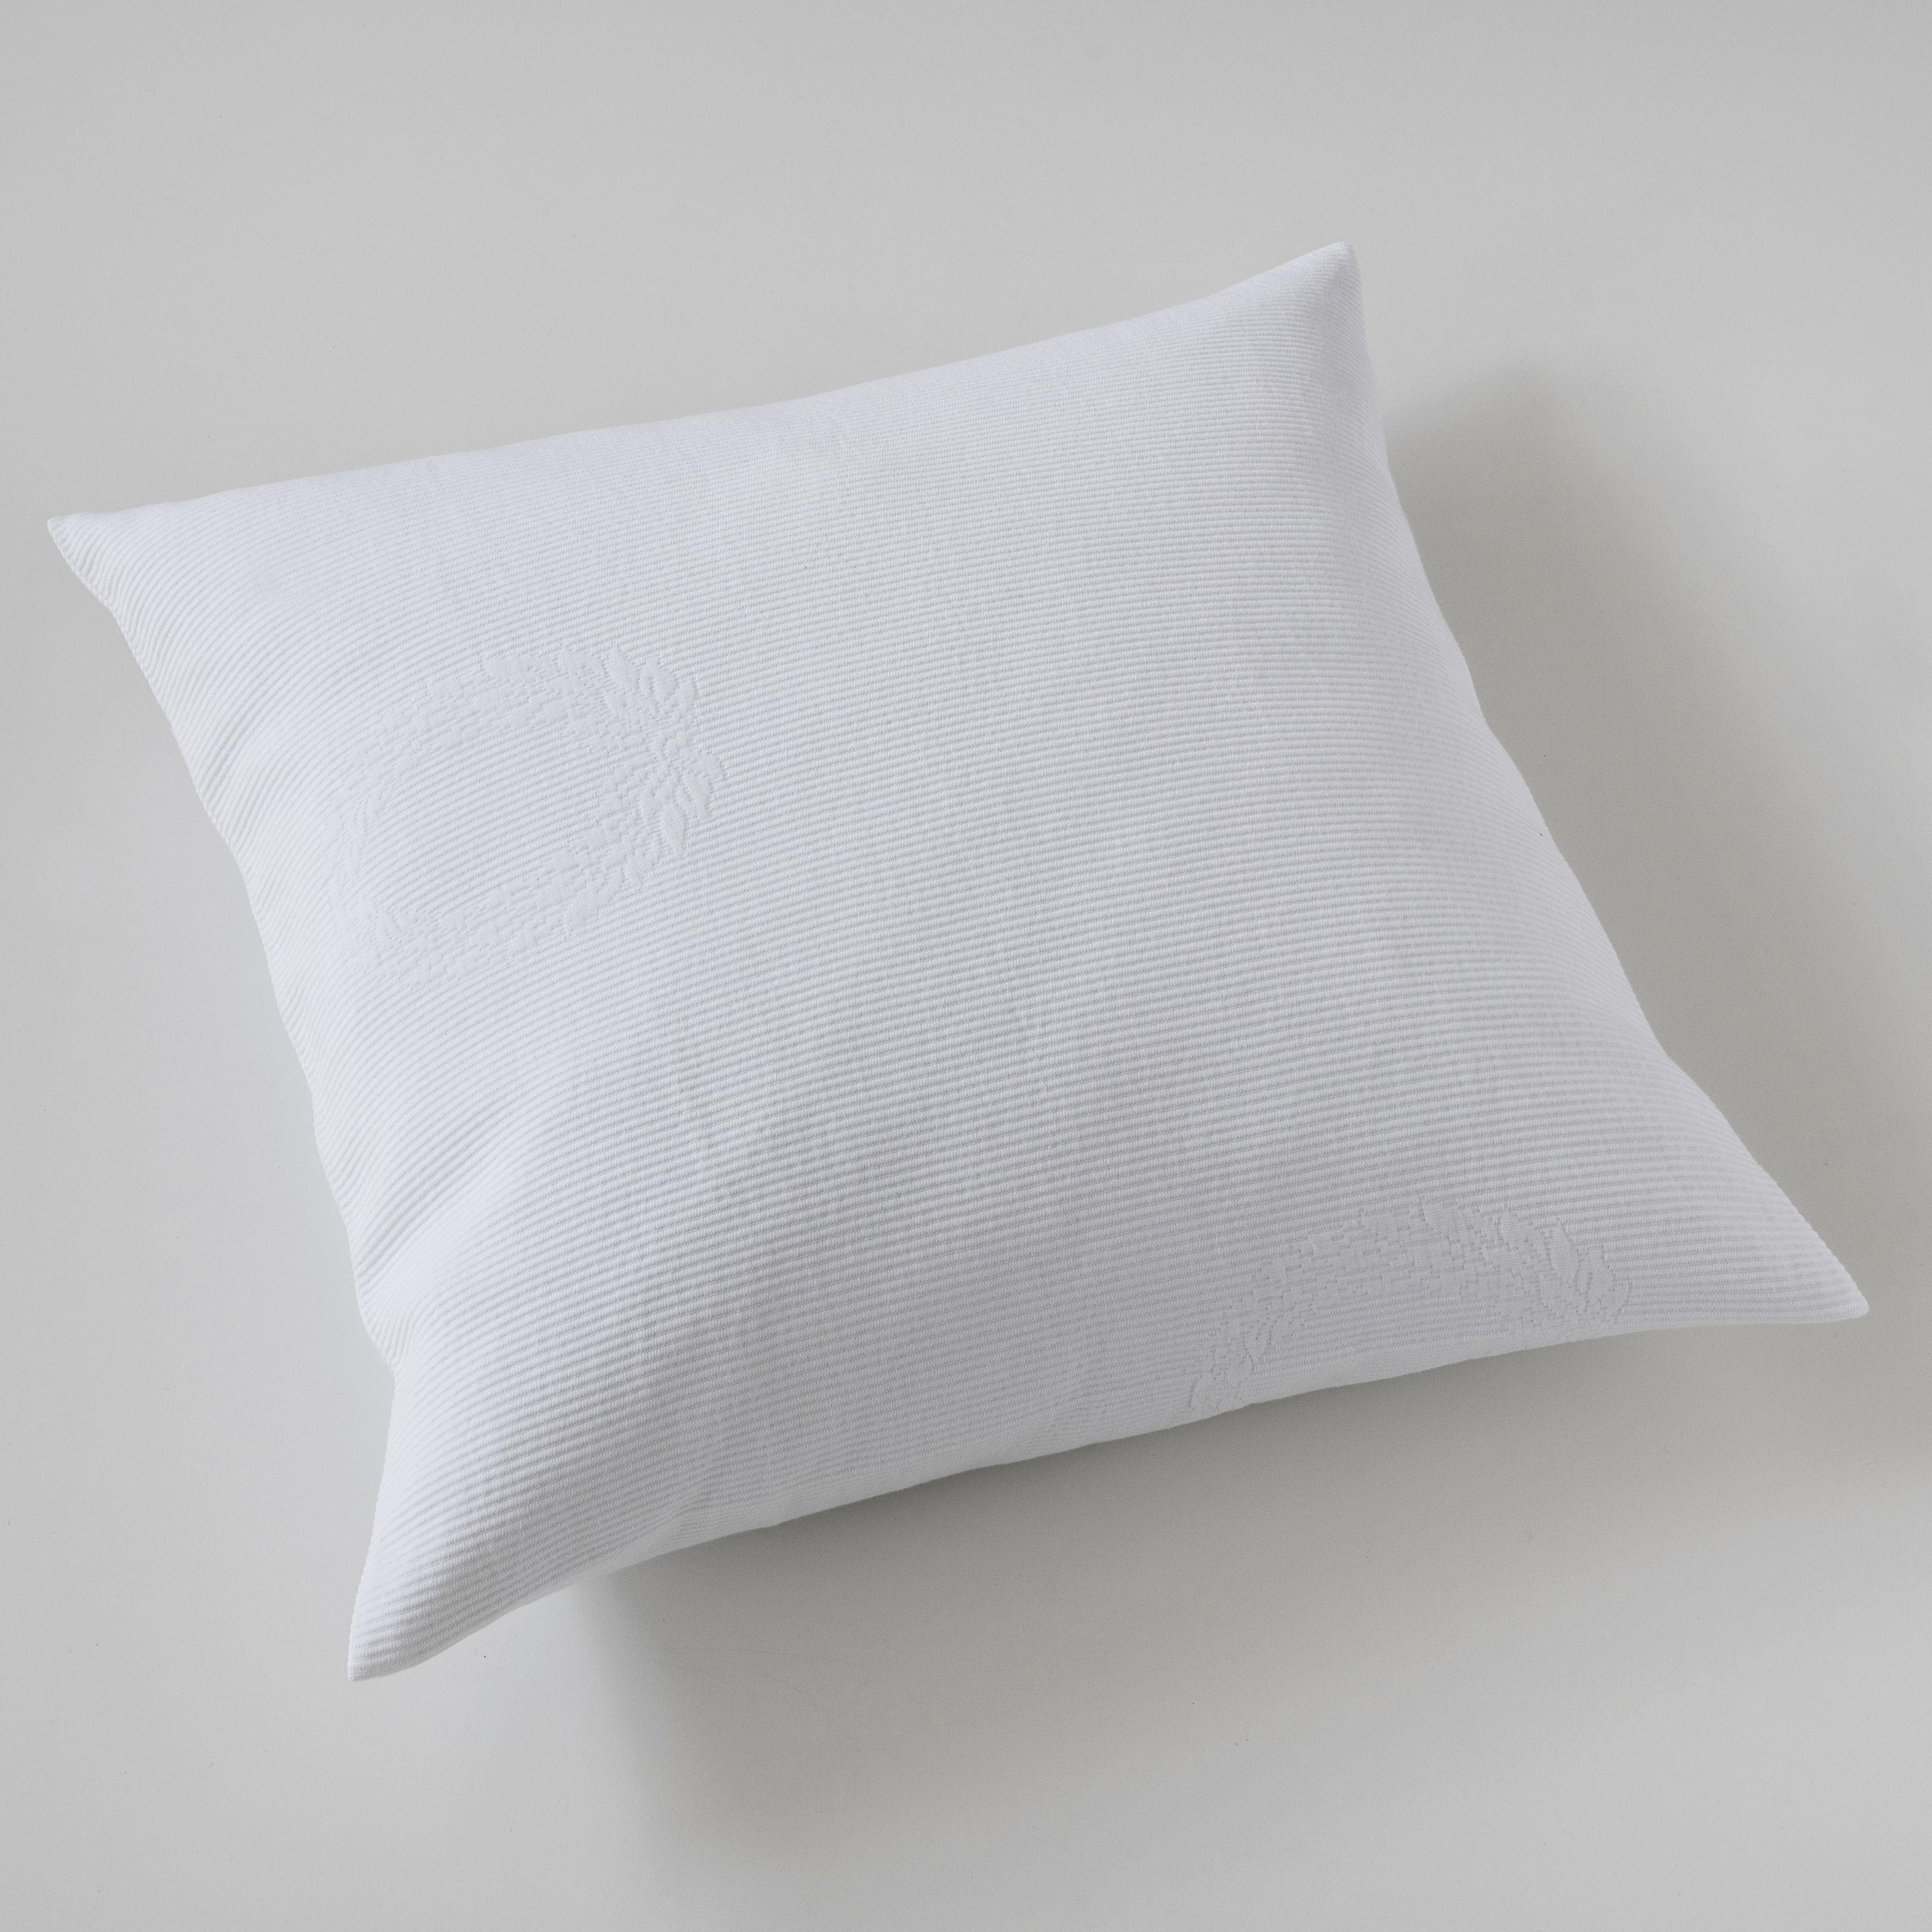 kissenbezug kr nze 50 x 50 cm wei bei. Black Bedroom Furniture Sets. Home Design Ideas